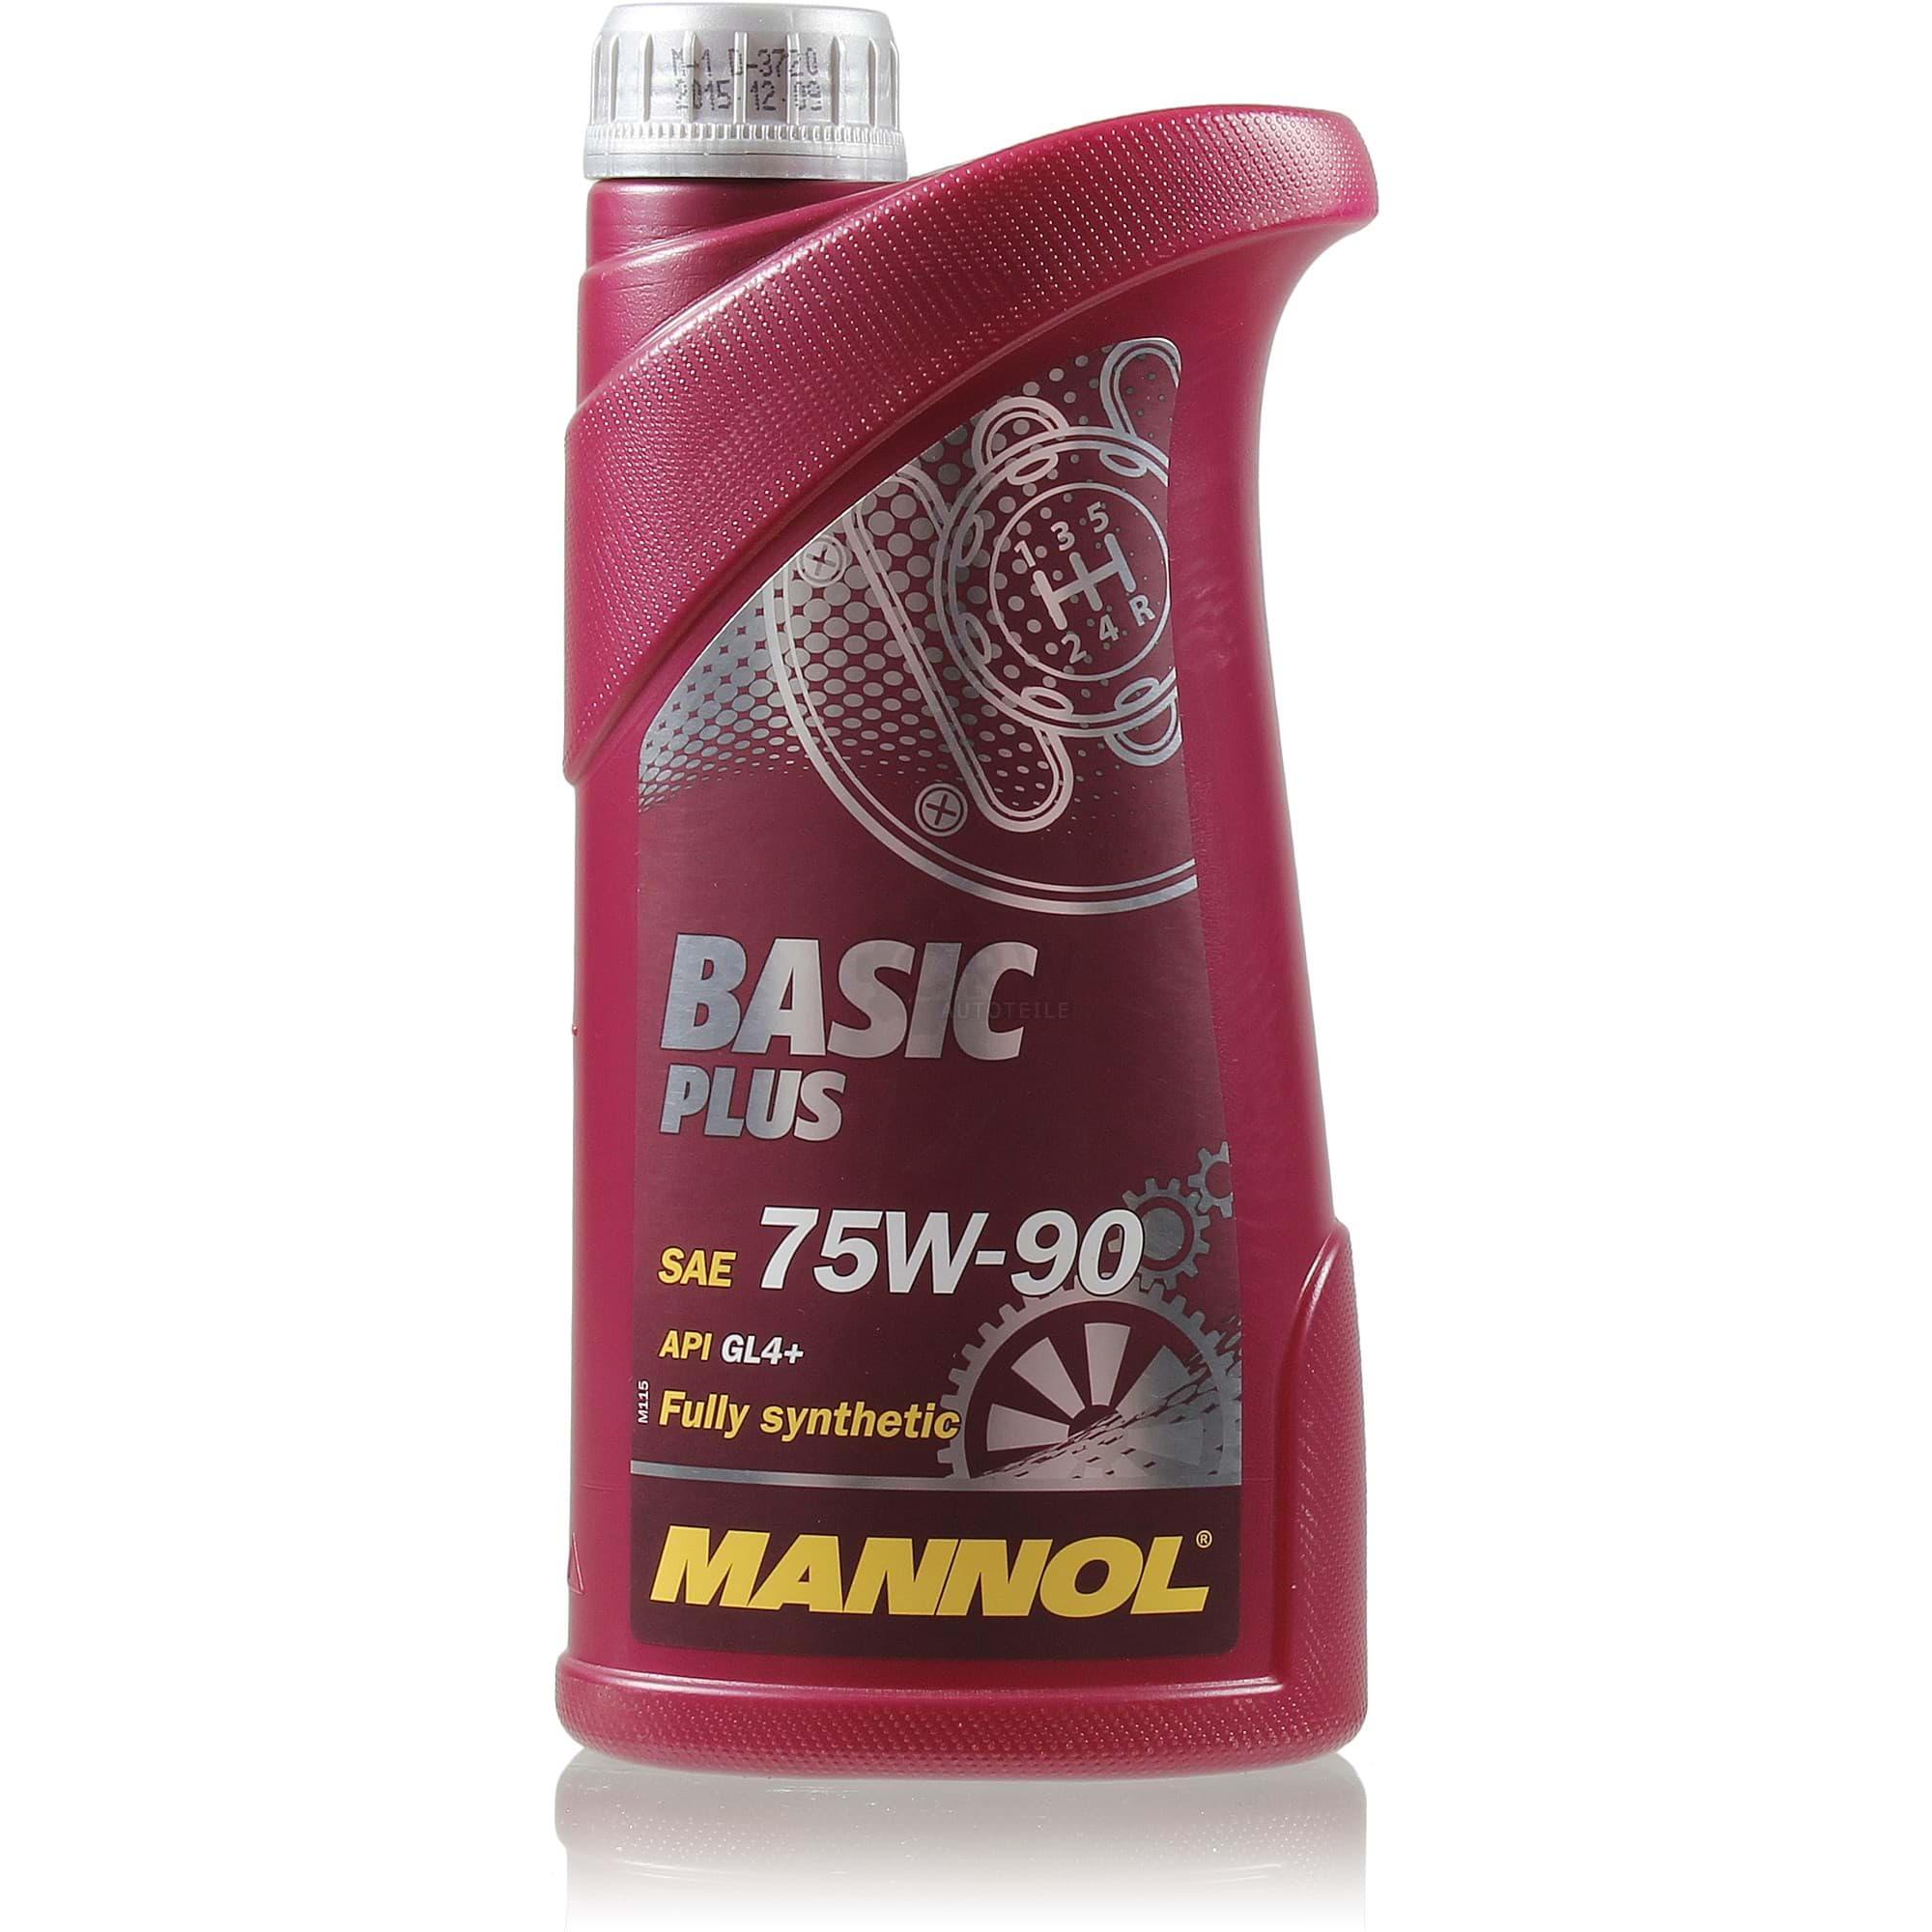 MANNOL Трансмиссионное масло МКПП Basik Plus SAE 75w90 4л Full-synthetic